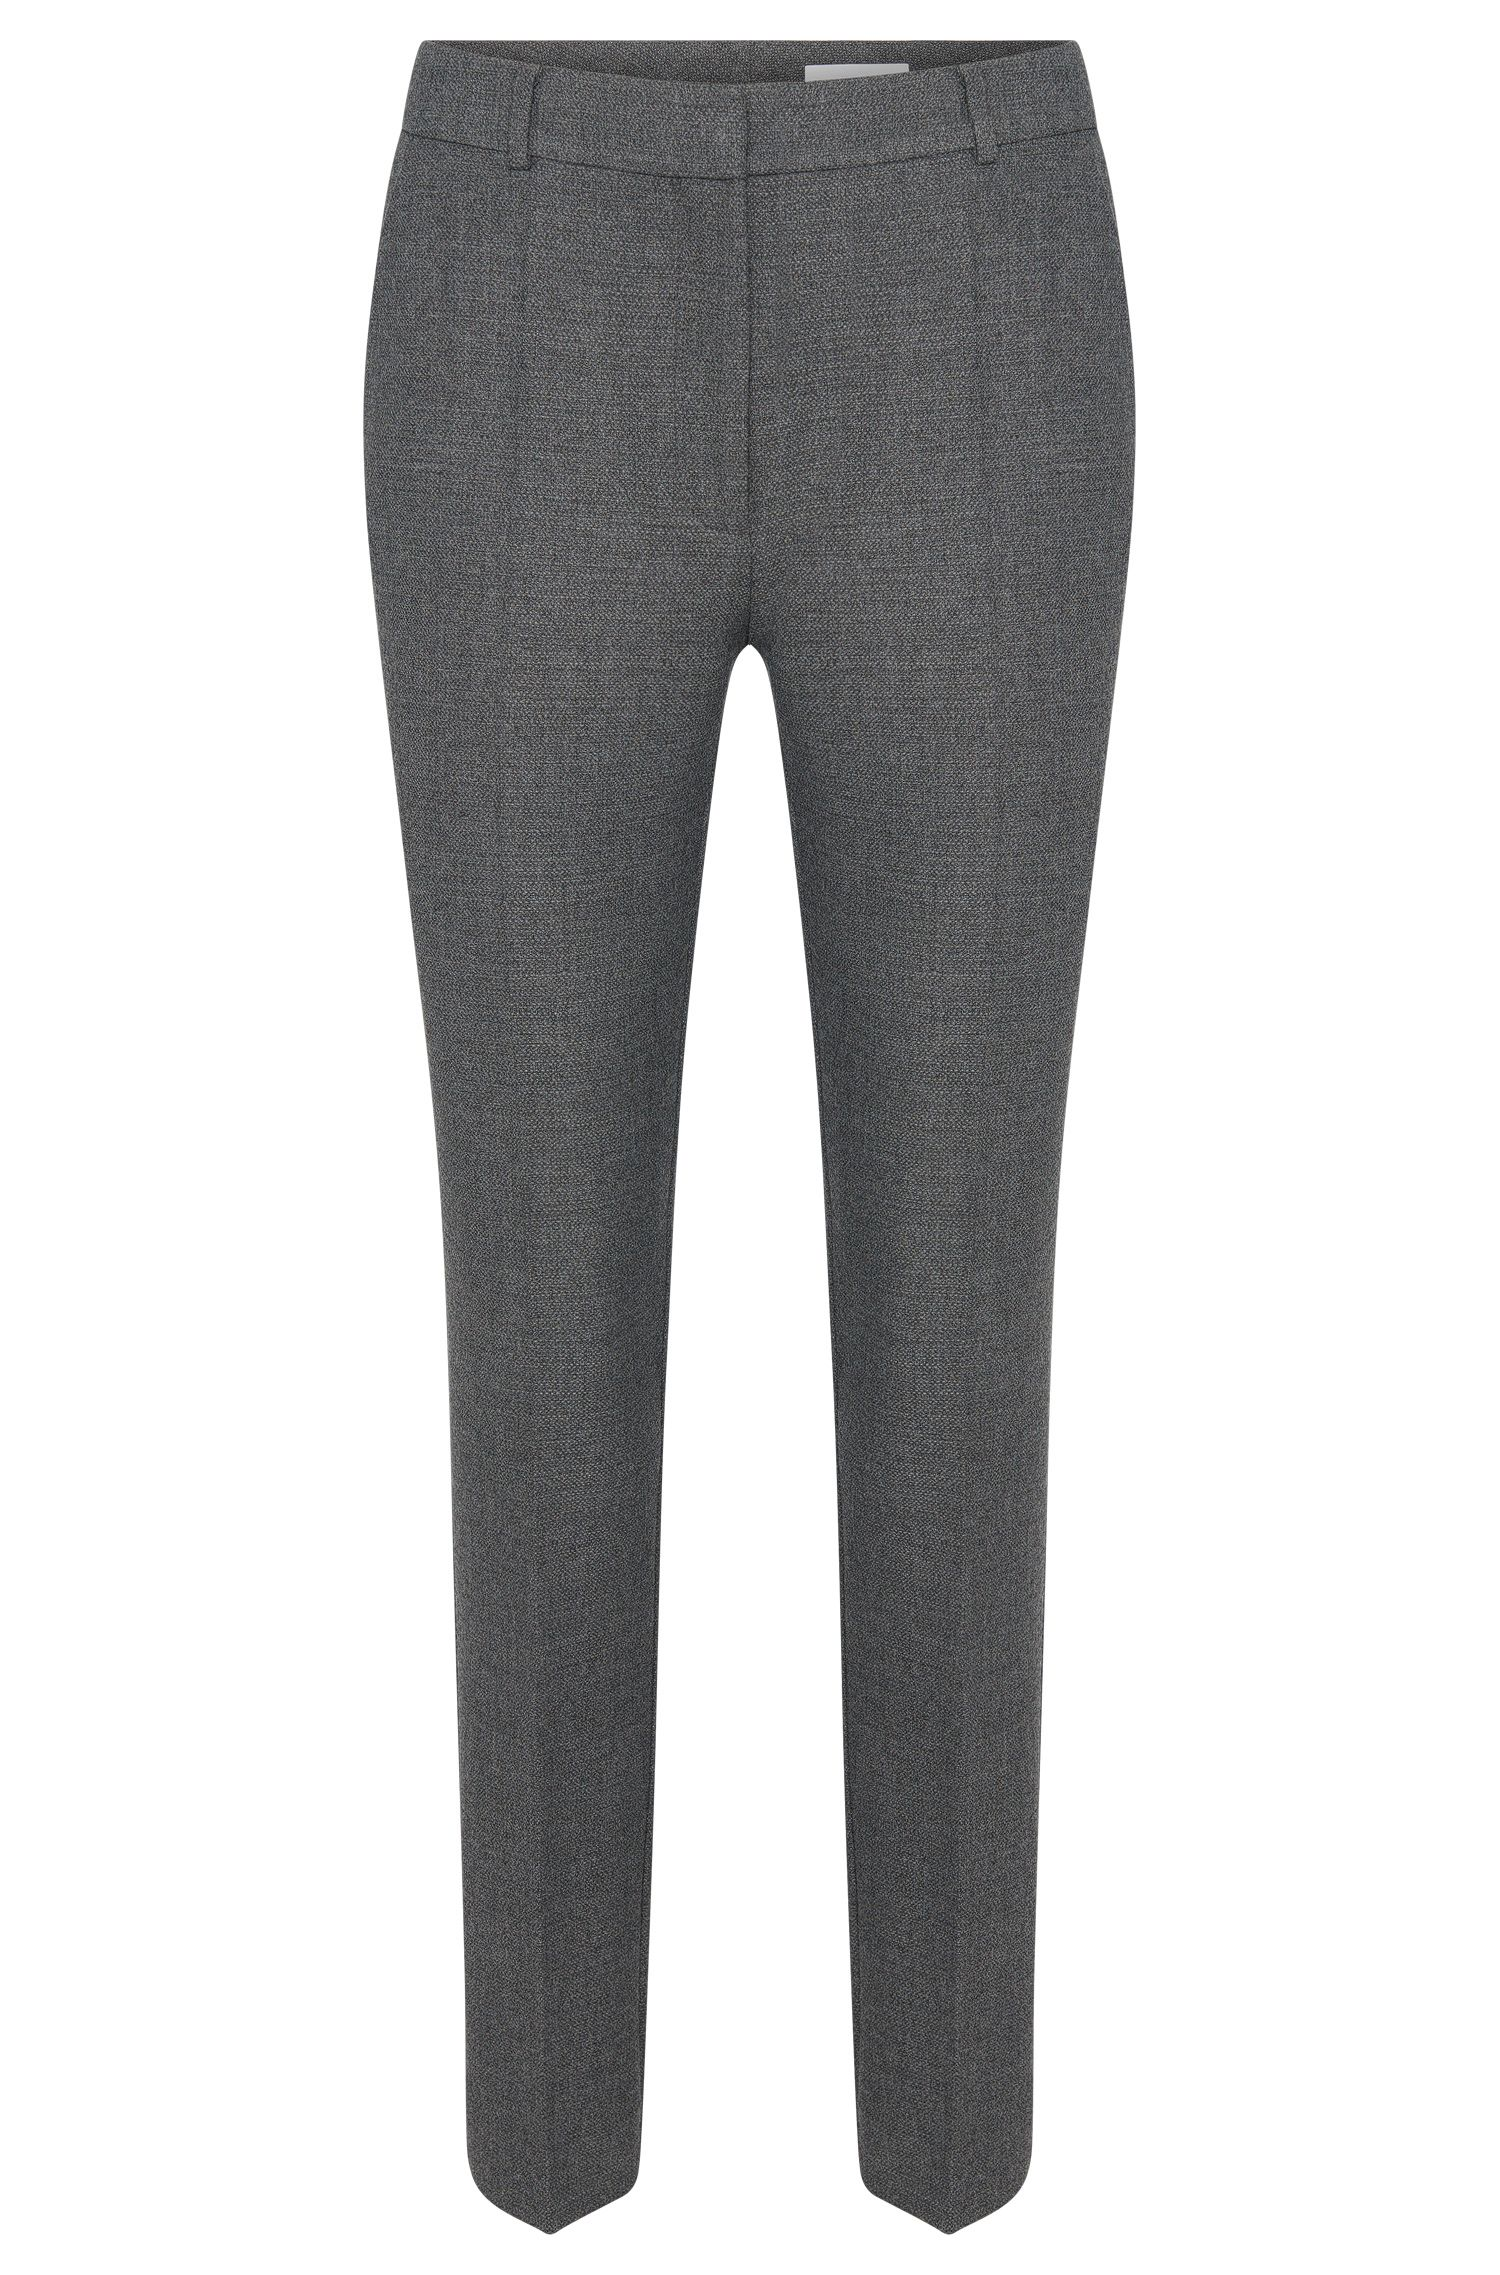 'Acnes'   Stretch Virgin Wool Blend Melange Trousers